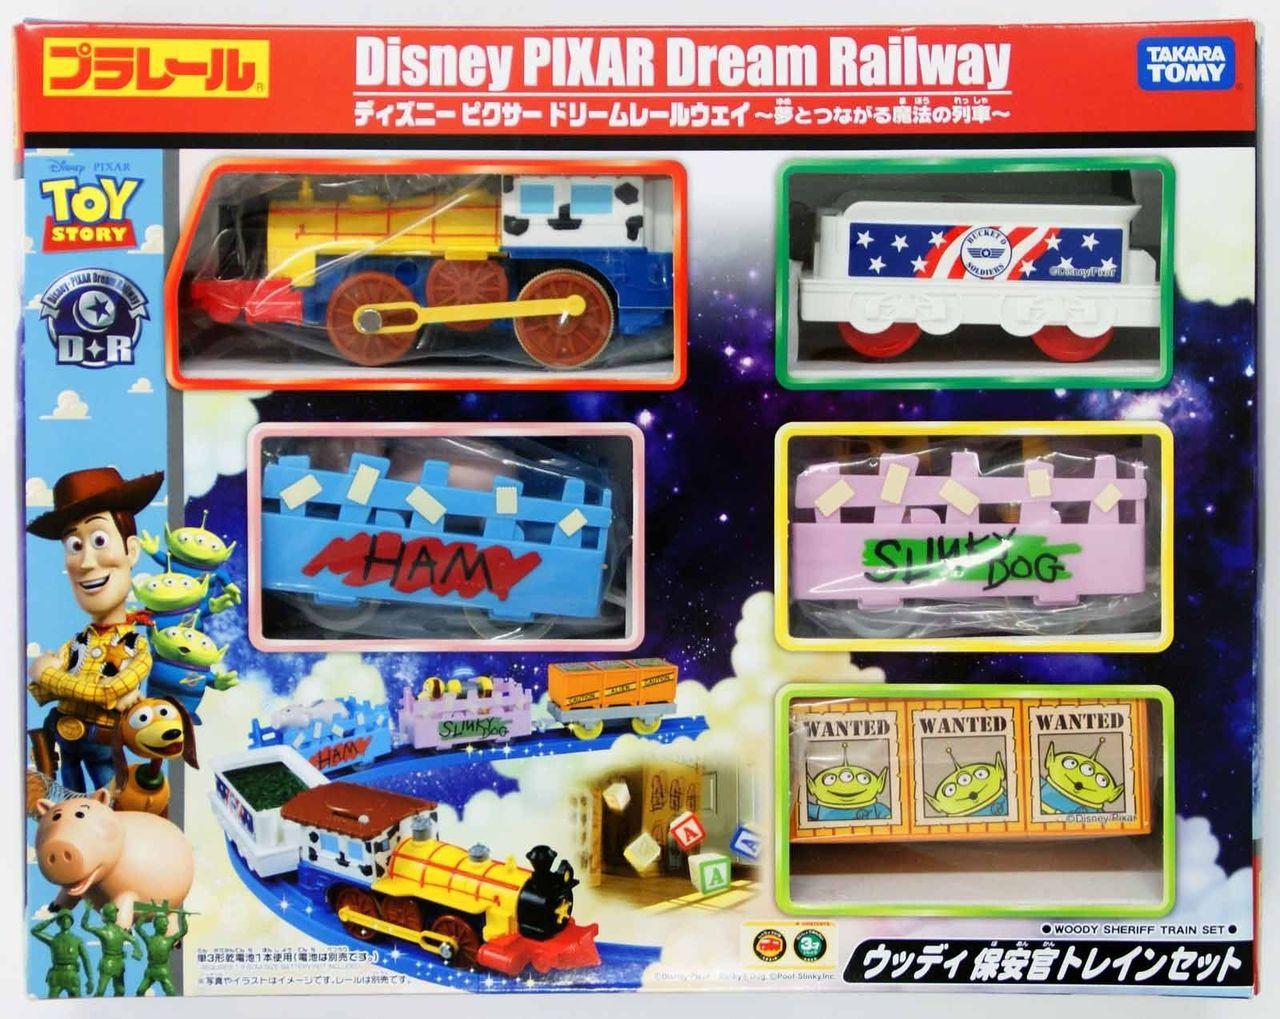 Takara Tomy Pla Rail Plarail Disney Dream Railway Toy Story Train Set 819325 Plaza Japan